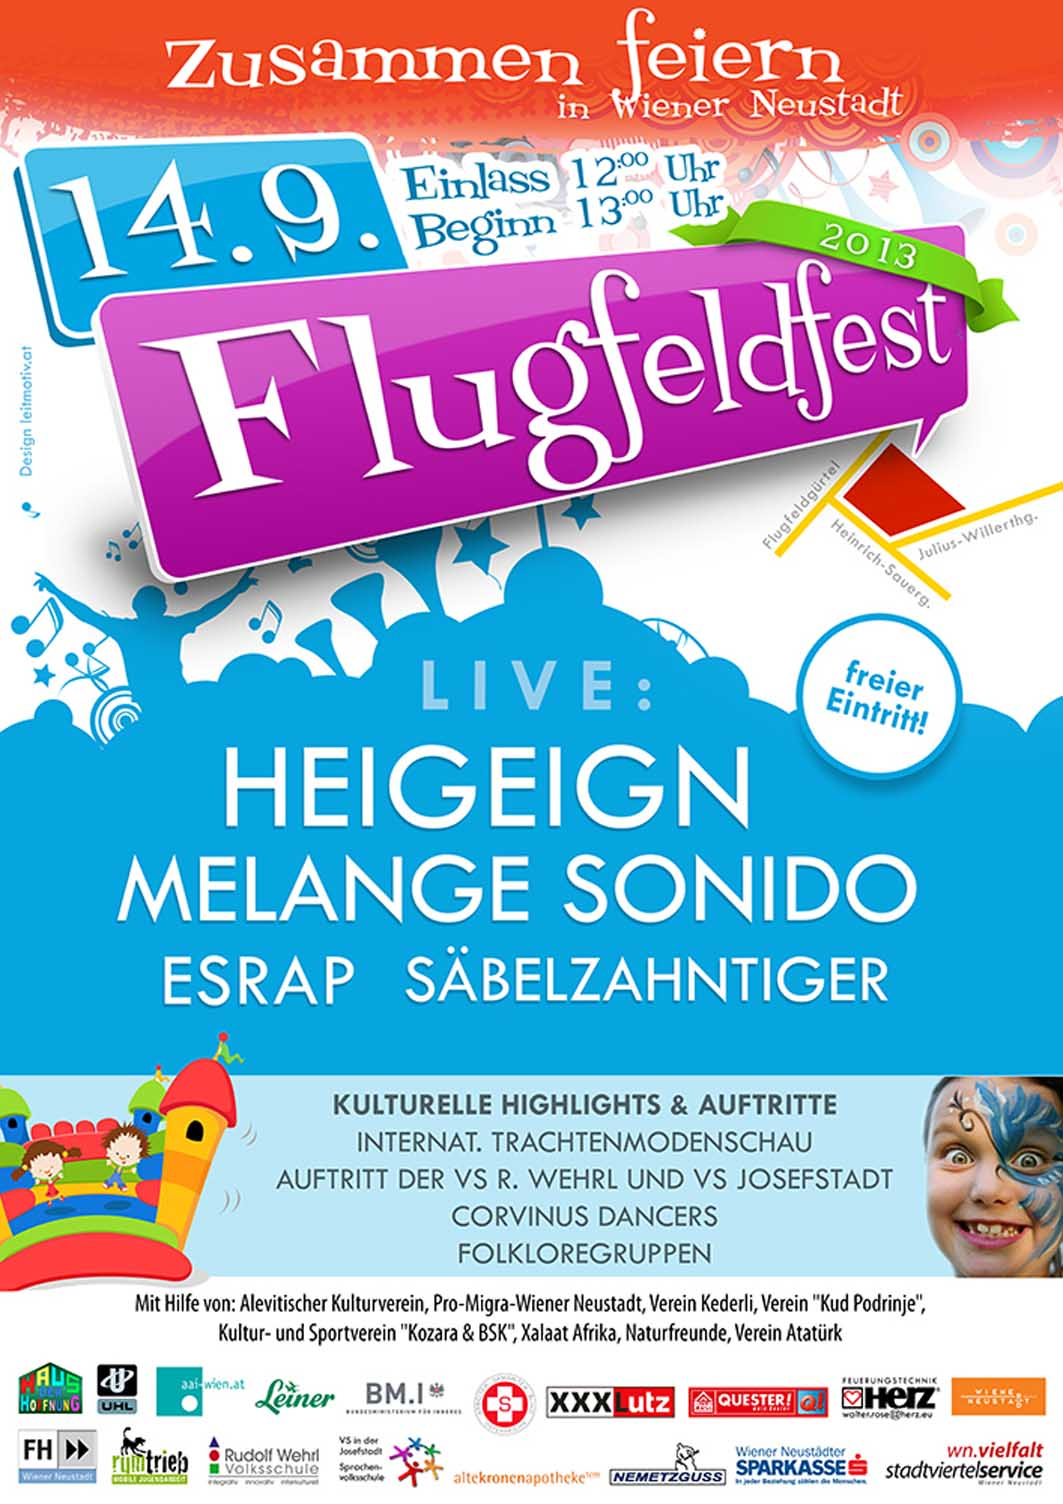 Foto: Poster Flugfeldfest 2013